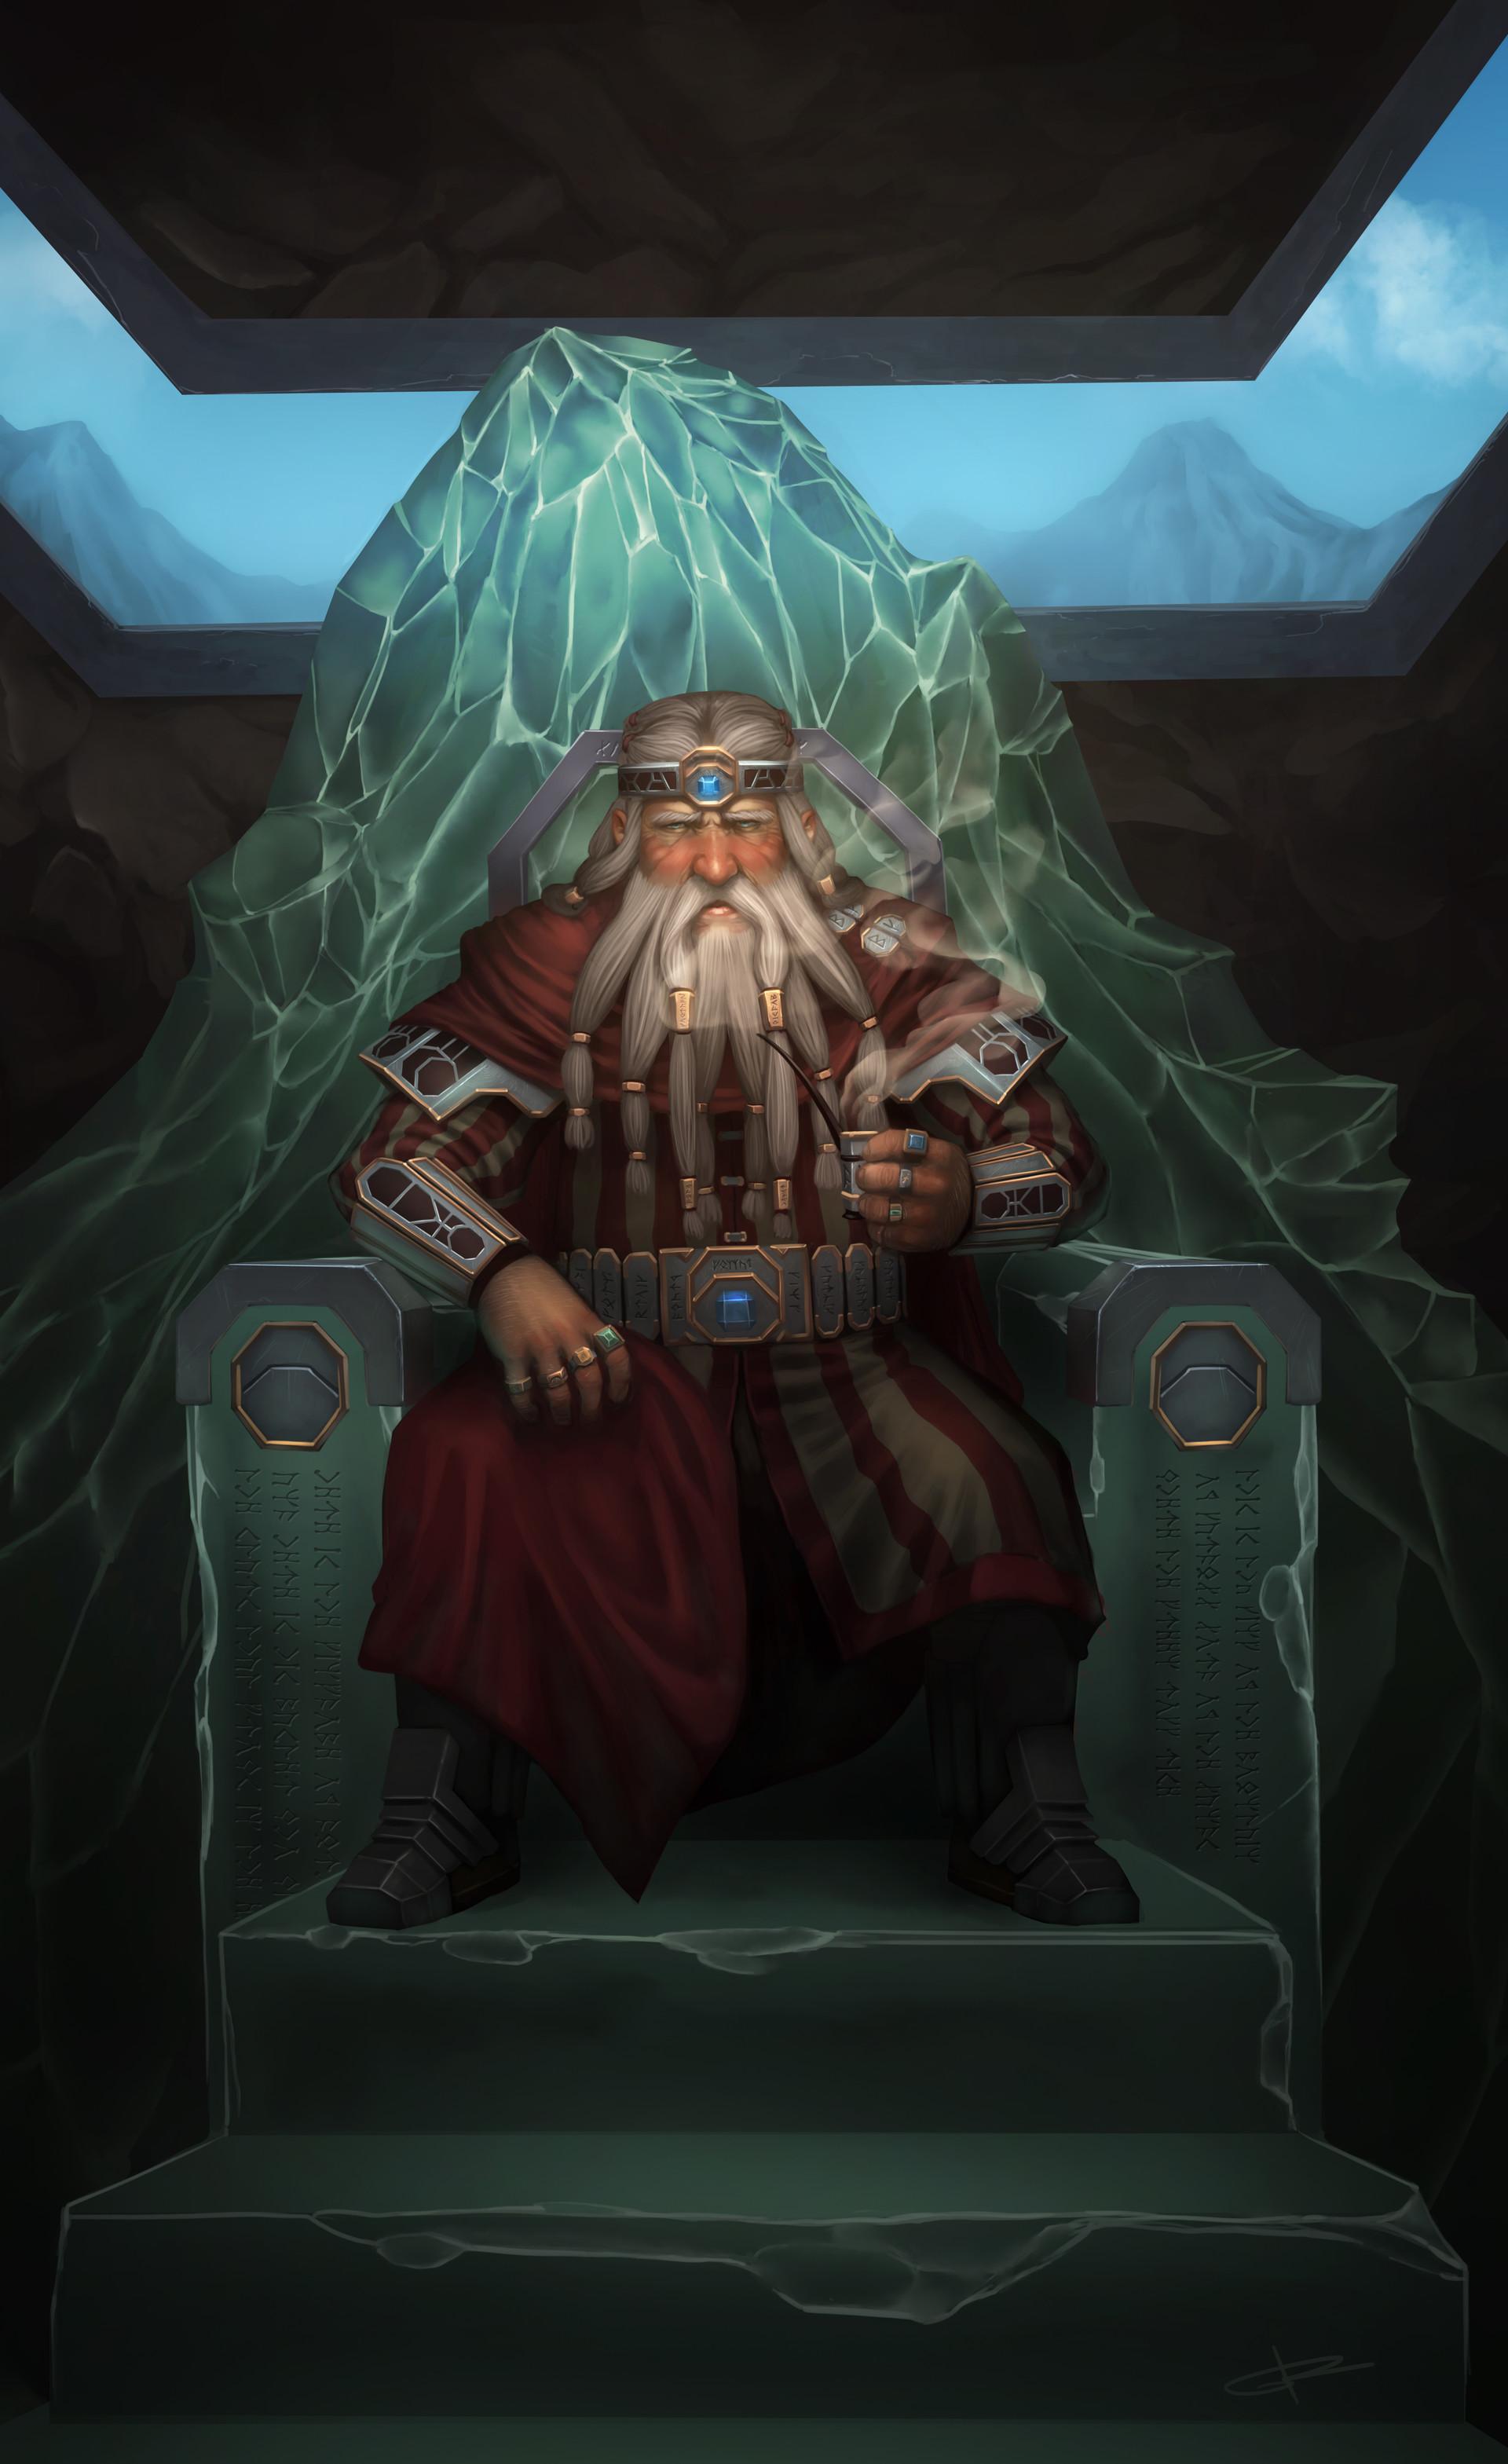 Alejandro cervantes dwarf king of the mountain by grenias d6uosw6